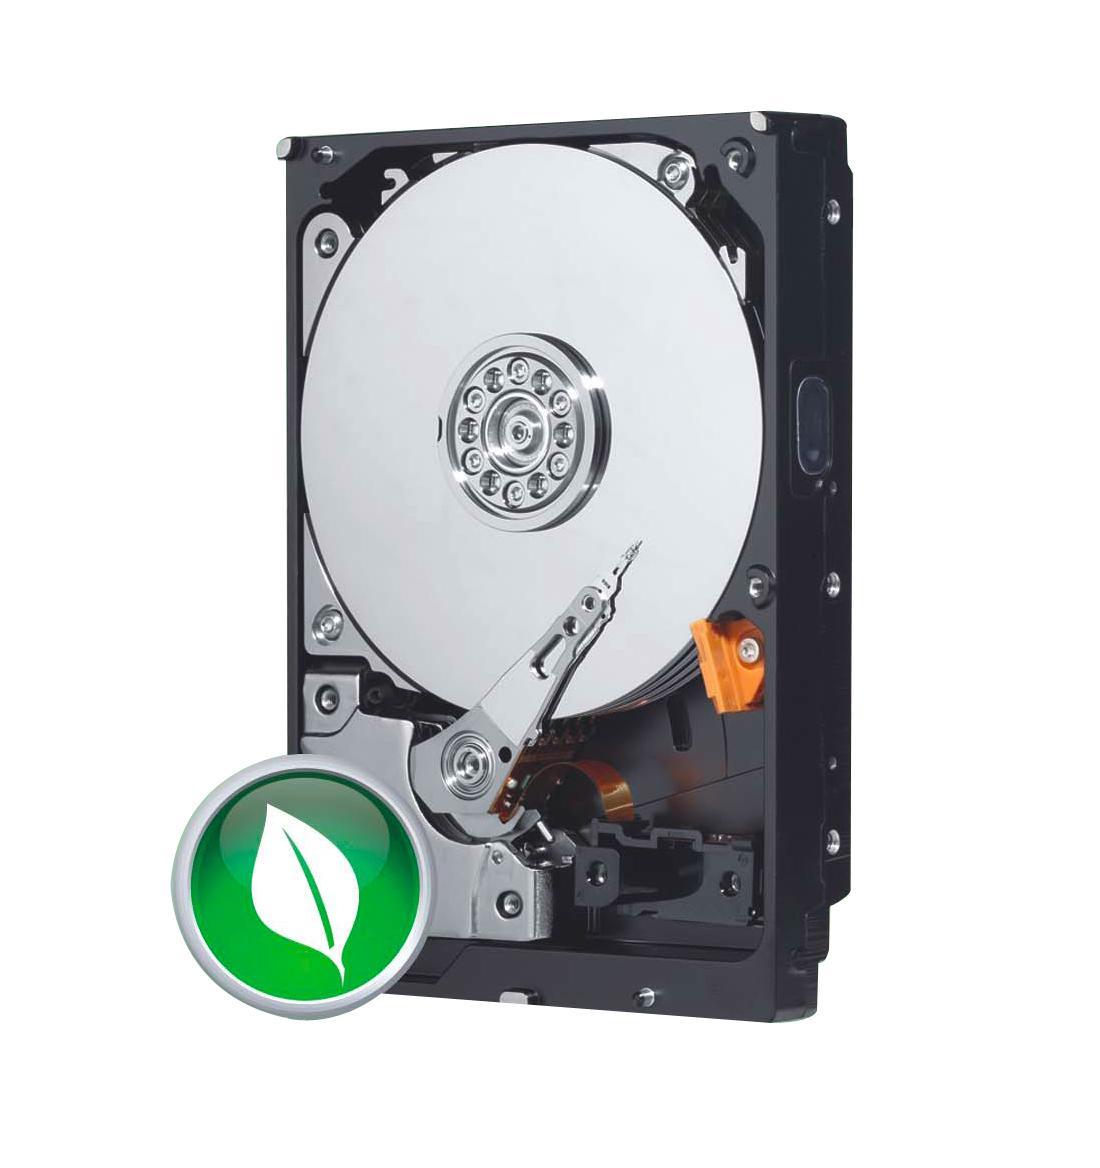 WD推出第四代更低溫、更低噪音及更環保的硬碟